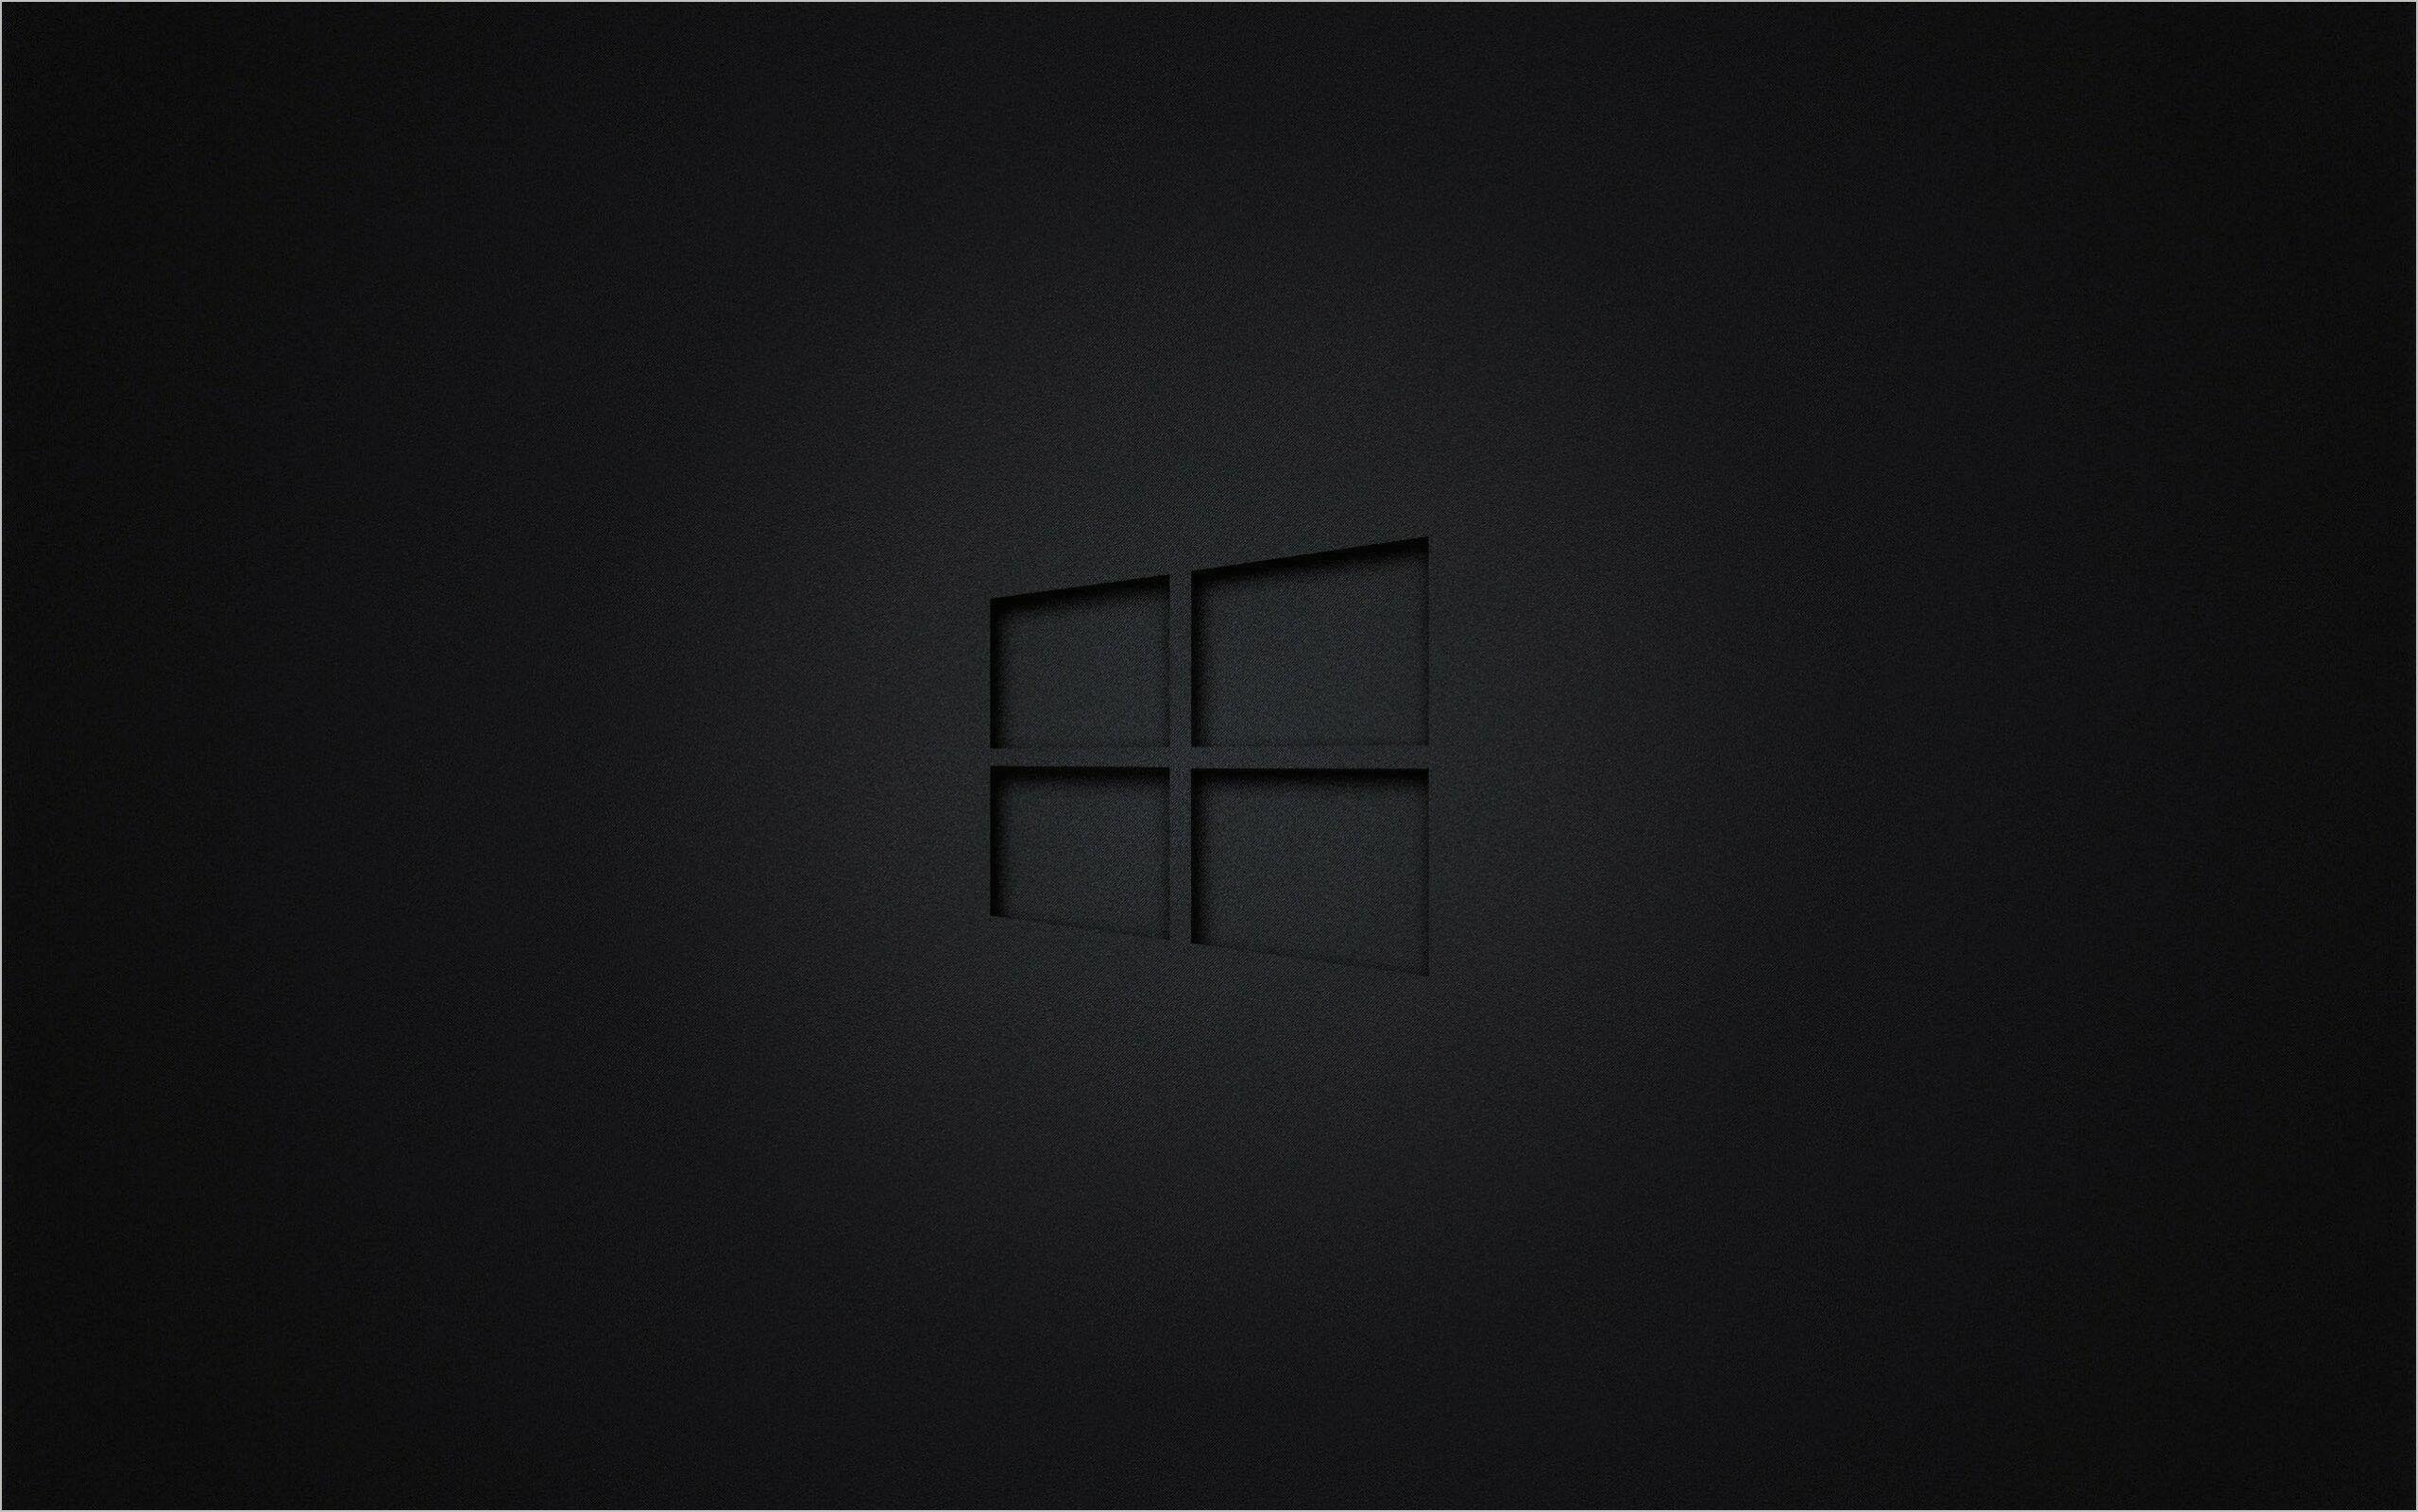 Dark Mode Wallpaper 4k Samsung In 2020 Hd Dark Wallpapers Wallpaper Windows 10 Wallpaper Pc